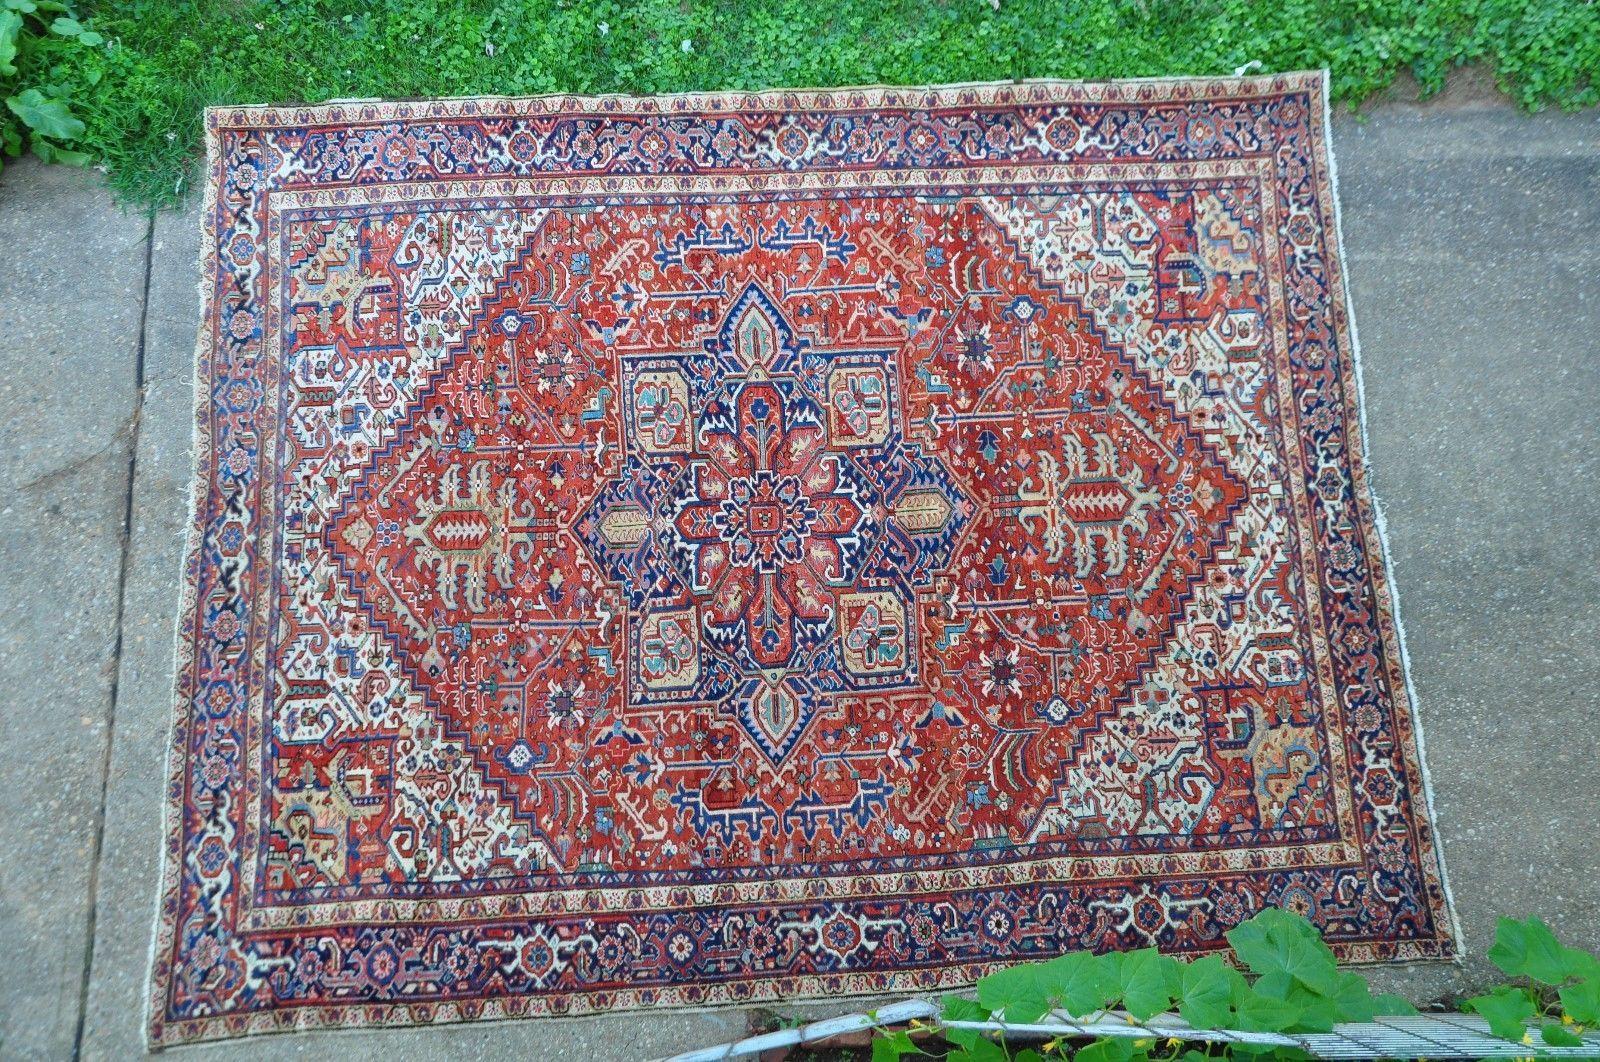 Antique Persian Heriz Rug Serapi Rug 10x12 Ebay Persian Heriz Rug Serapi Rug Rugs